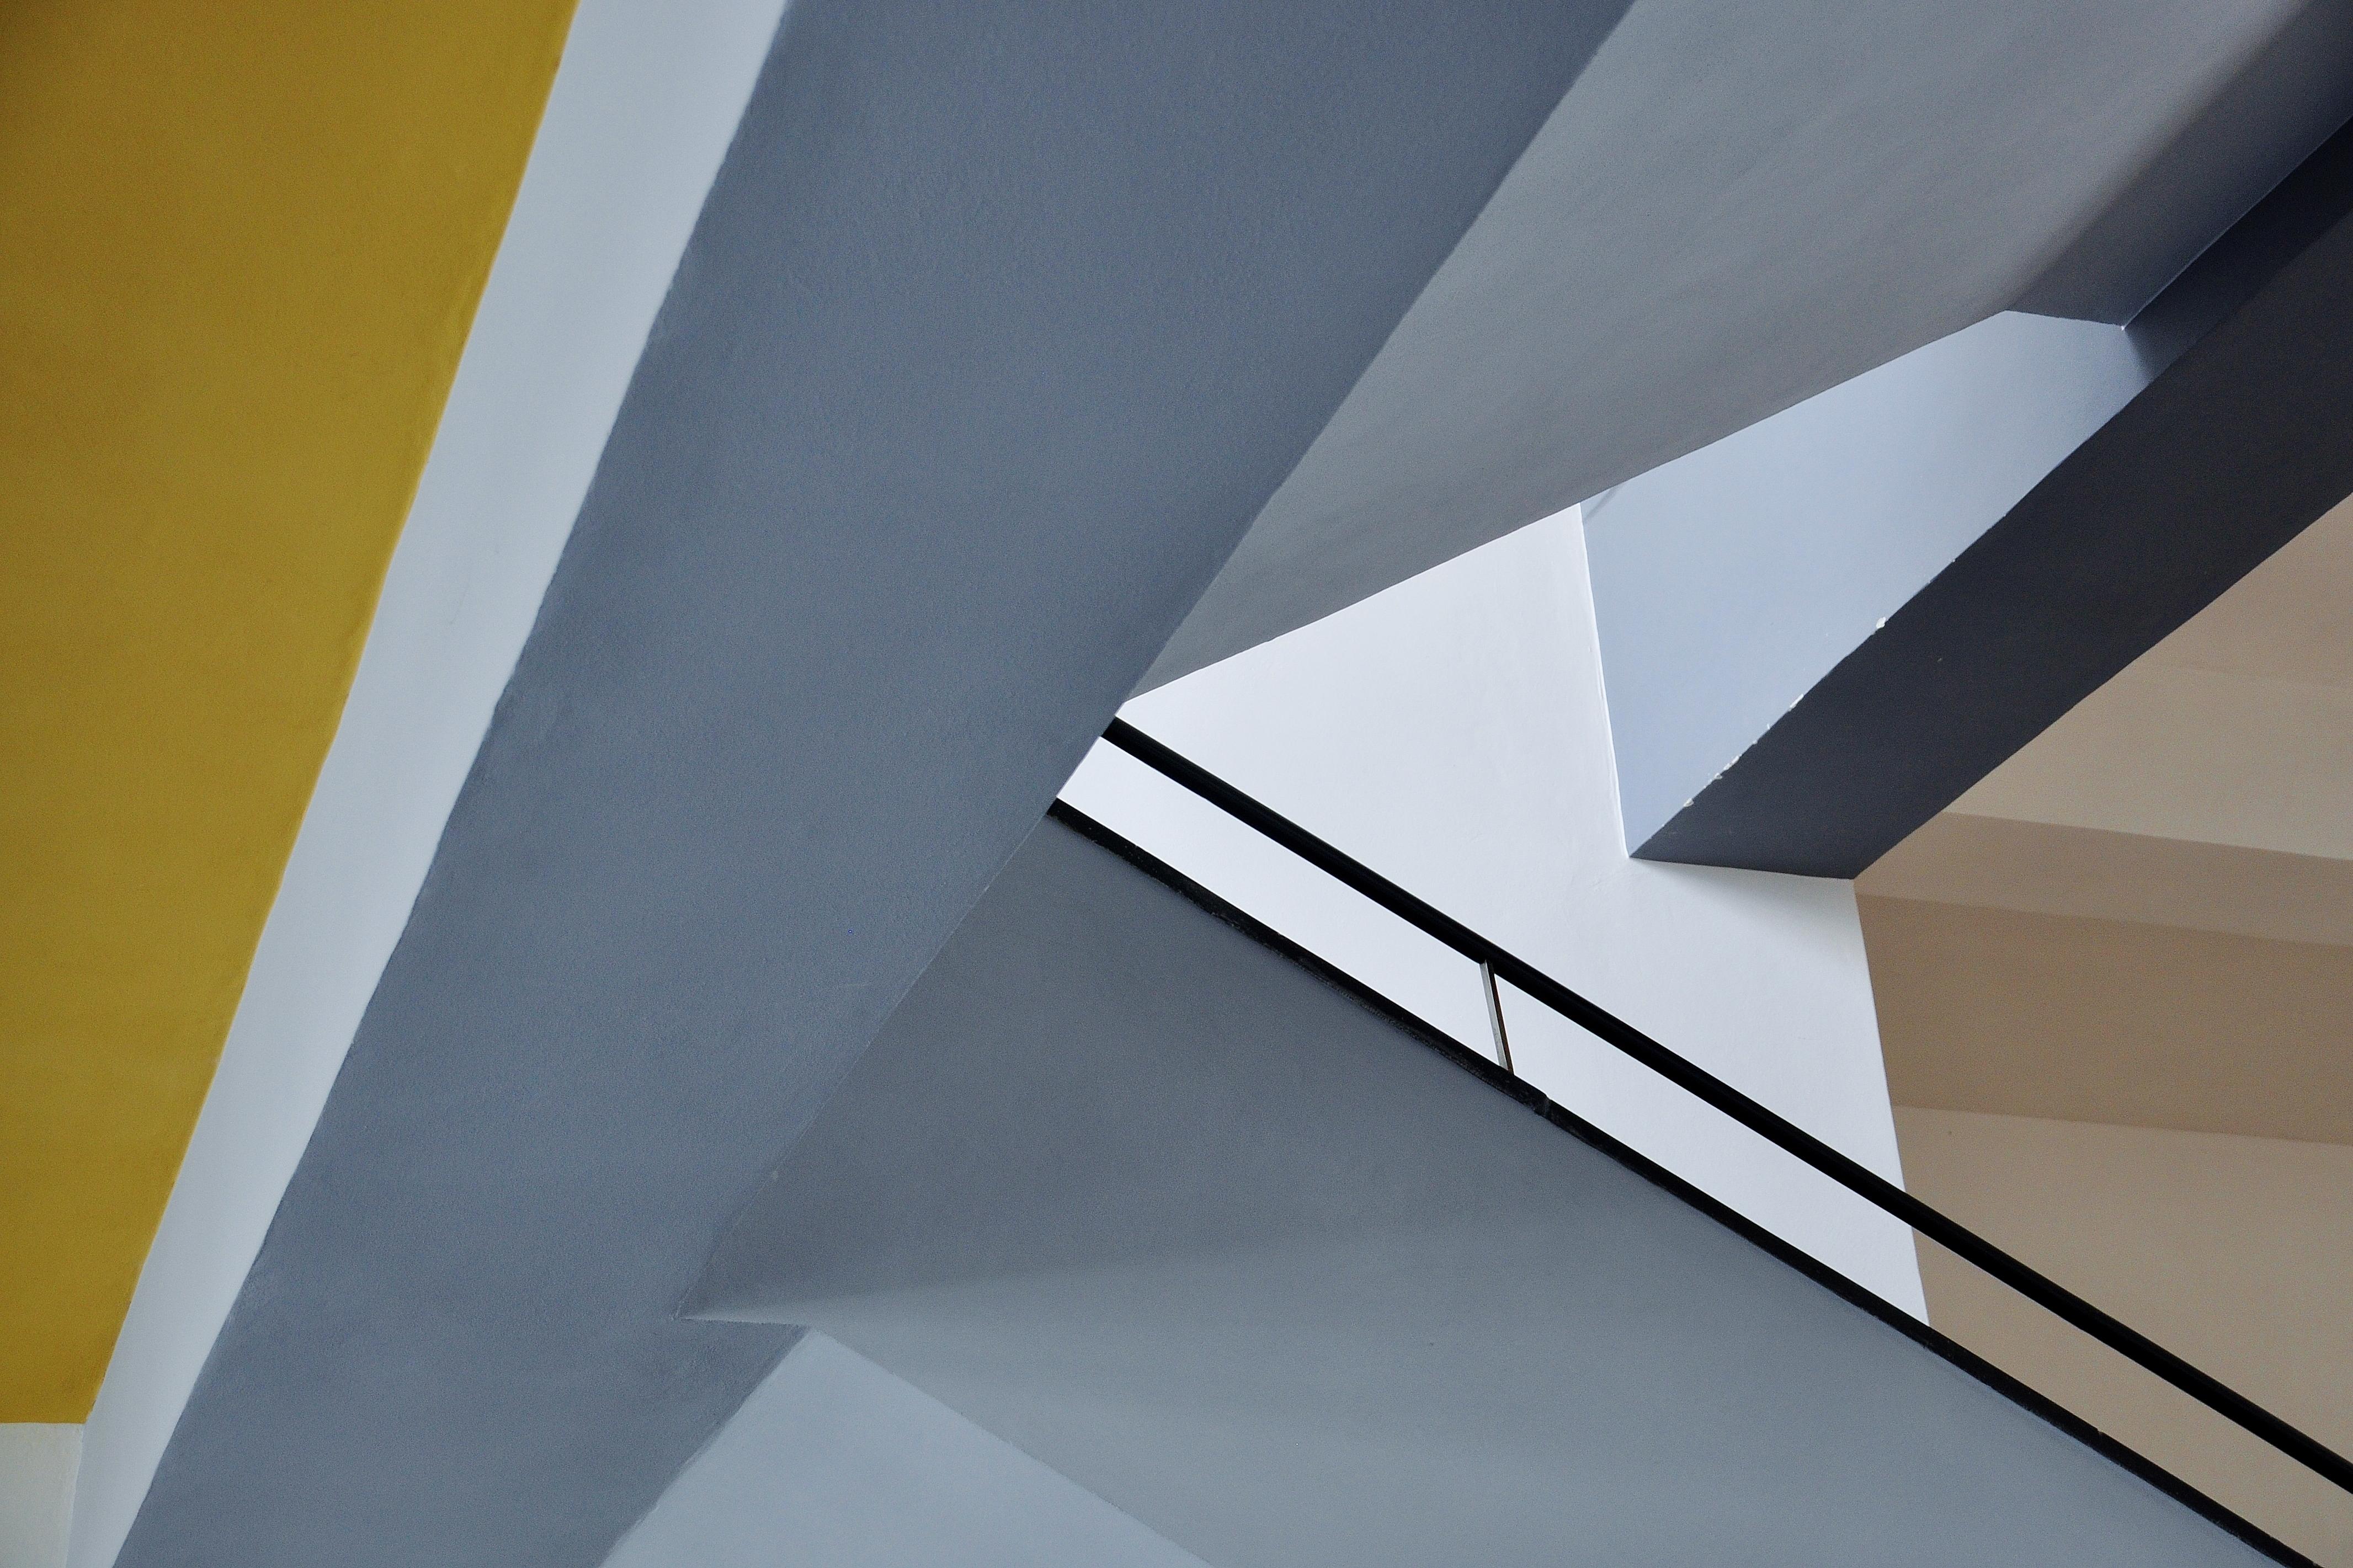 Bauhaus 10 by GMAdesigns